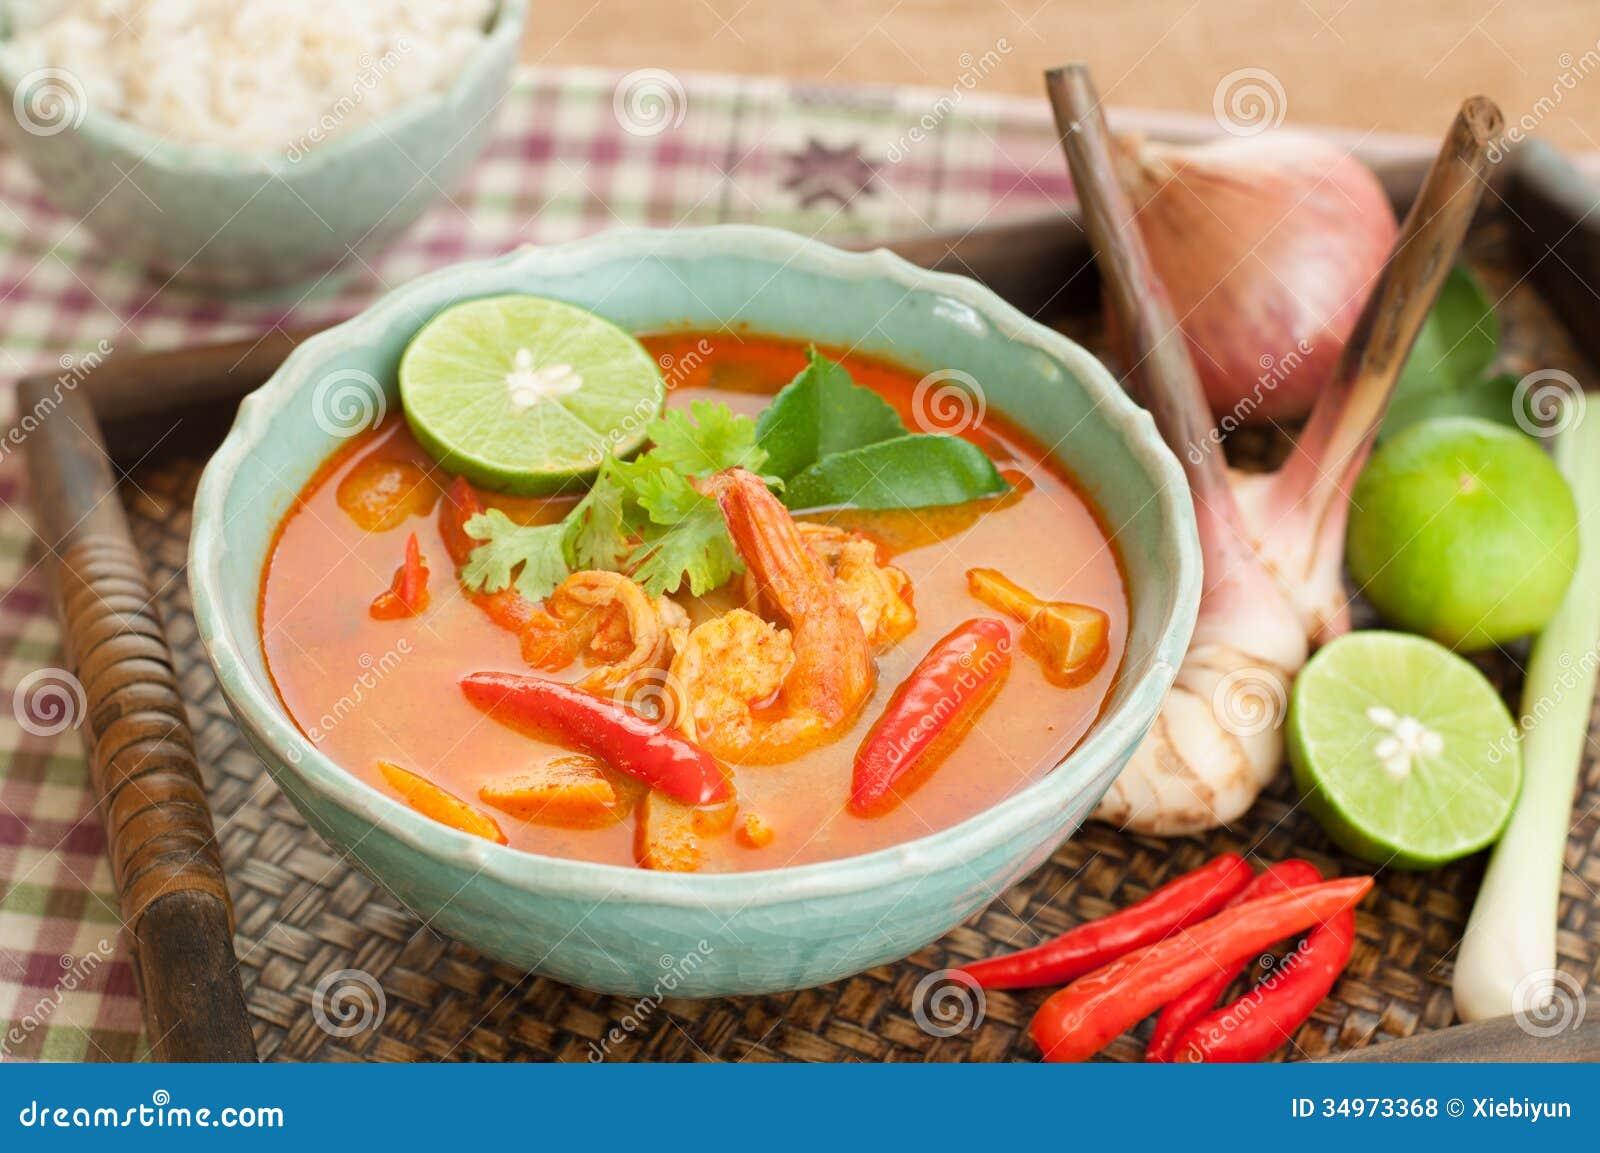 Tom Yum Goong Thai Cuisine, Prawn Soup With Lemongrass. Royalty Free ...